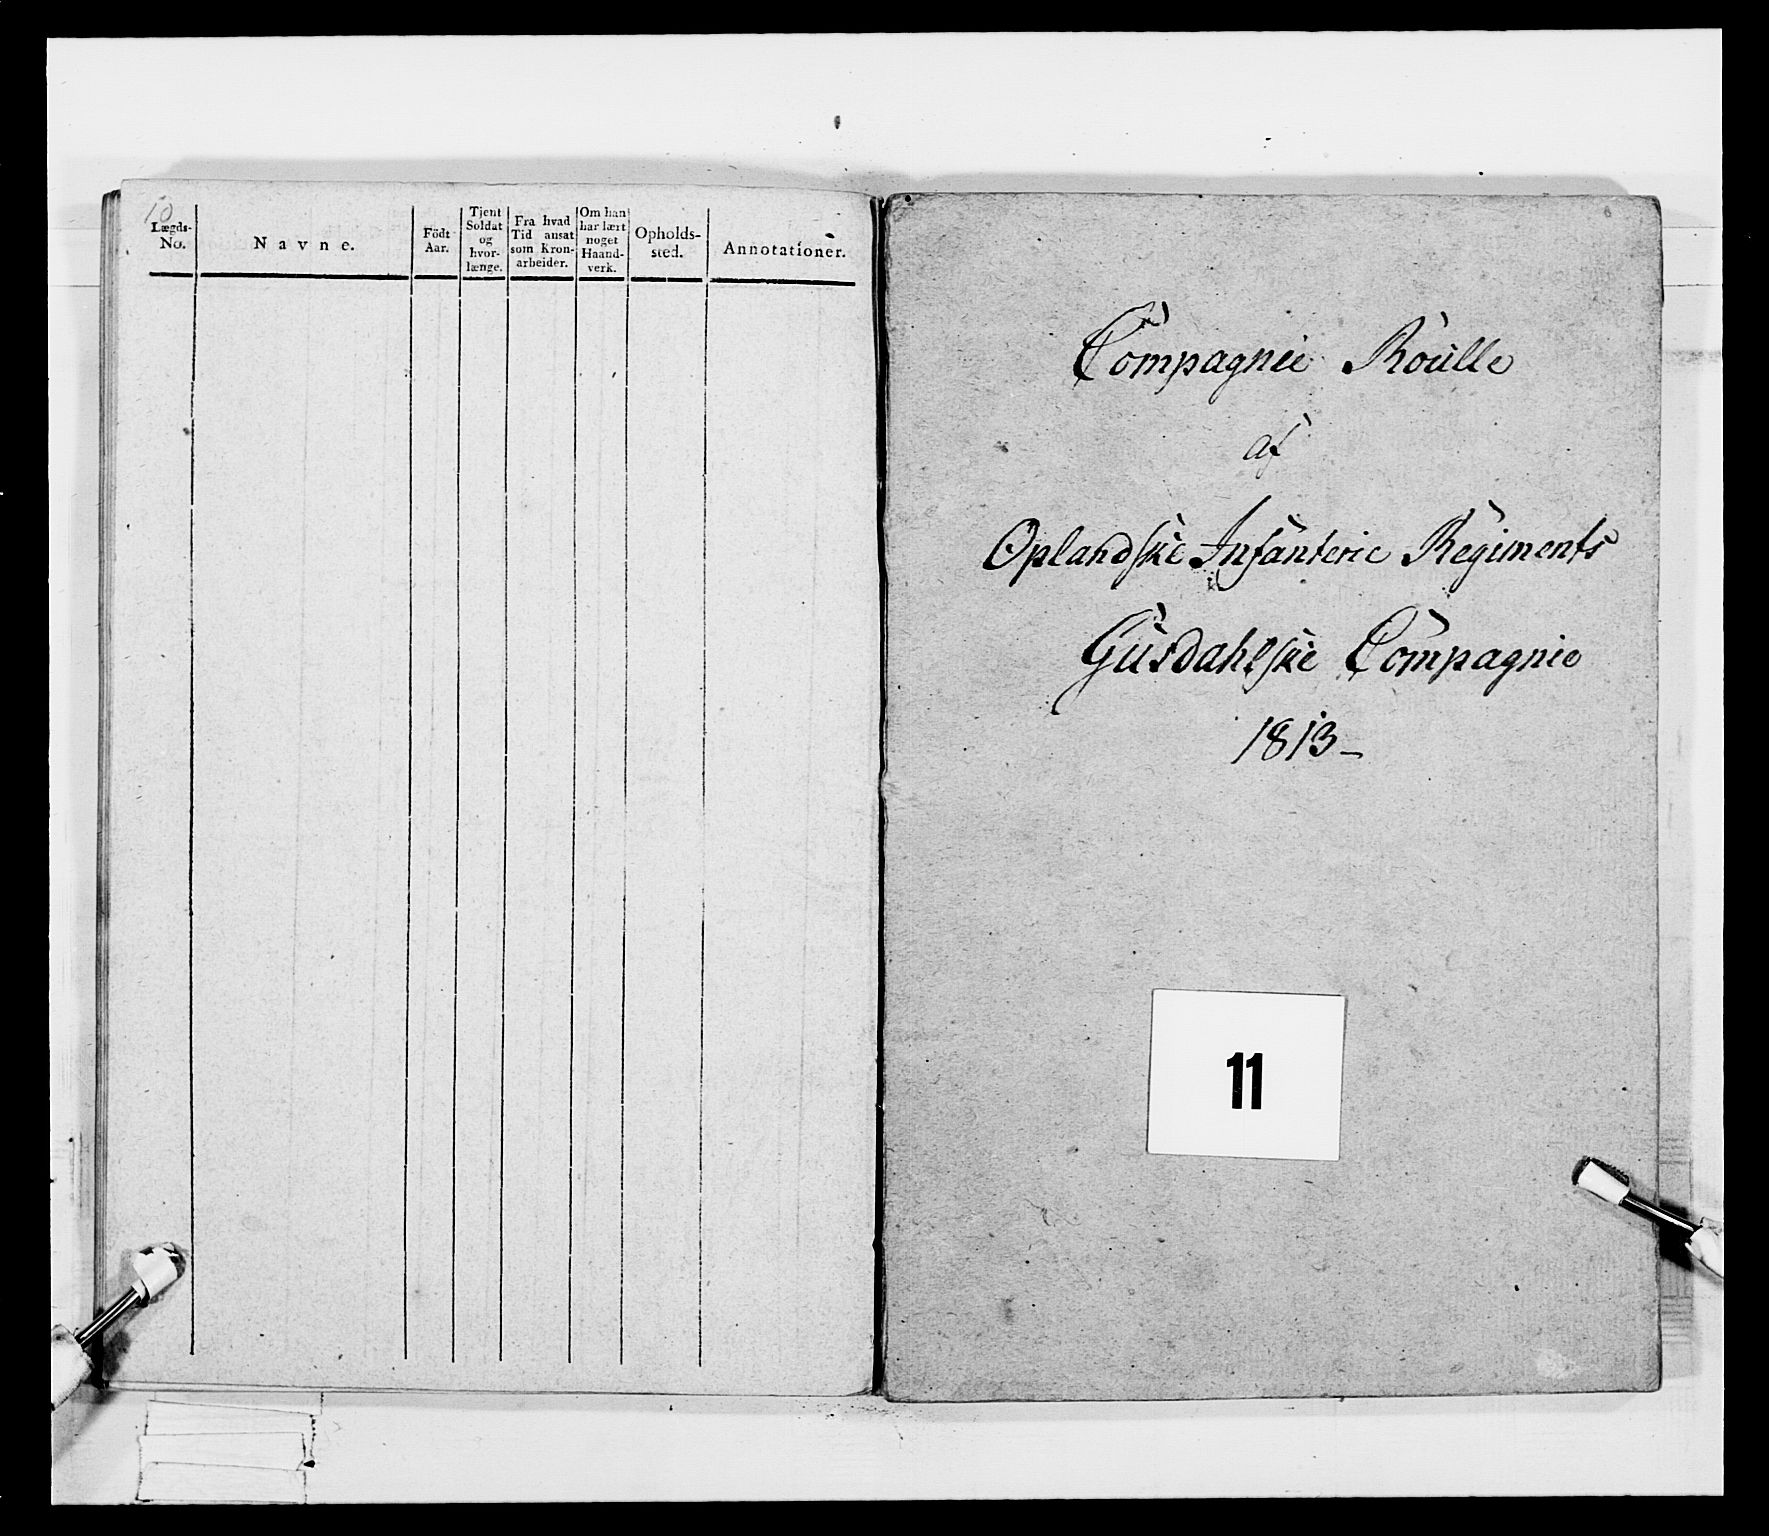 RA, Generalitets- og kommissariatskollegiet, Det kongelige norske kommissariatskollegium, E/Eh/L0069: Opplandske gevorbne infanteriregiment, 1810-1818, s. 514